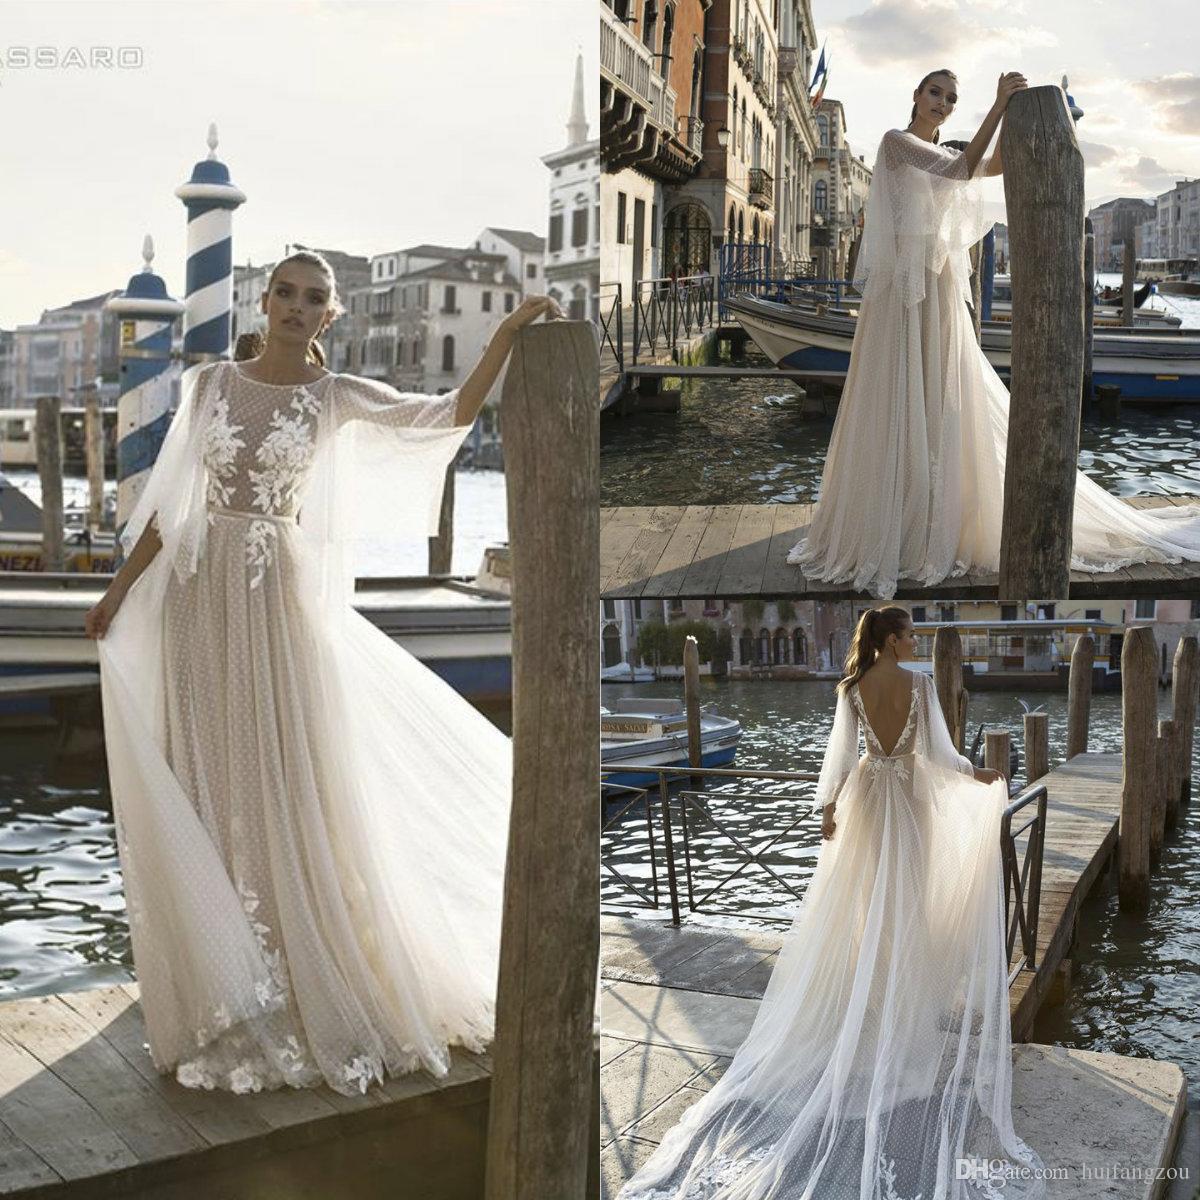 d872376ca2d Pinella Passaro Vintage Wedding Dresses 2019 Illusion Lace Applique Half  Sleeves Bridal Gowns Backless Beach Wedding Dress Custom Made Wedding  Dresses ...